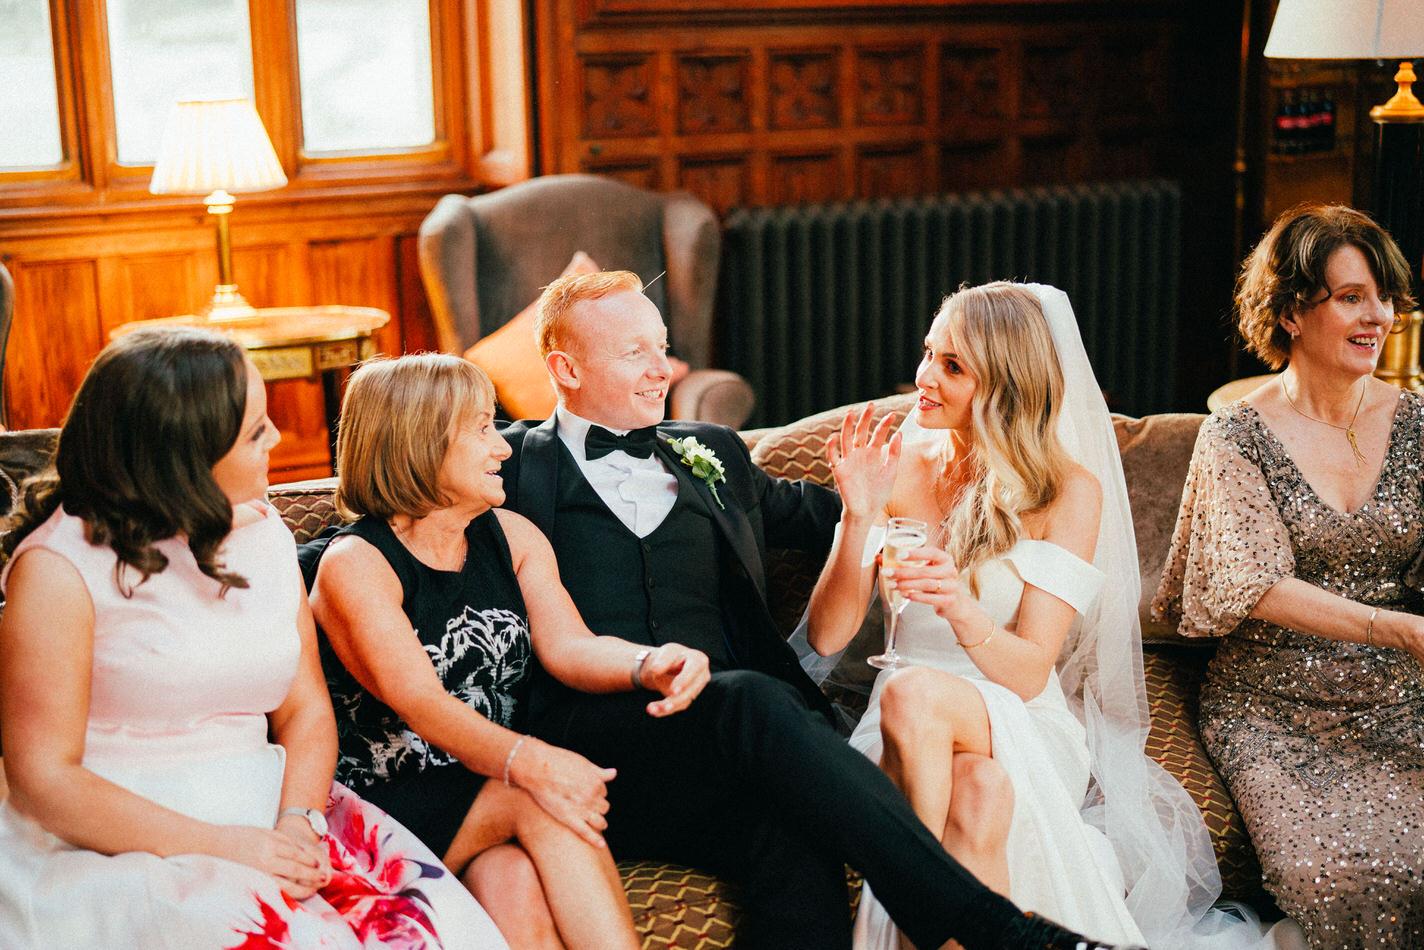 Castle-wedding-ireland-photos- 0236 176